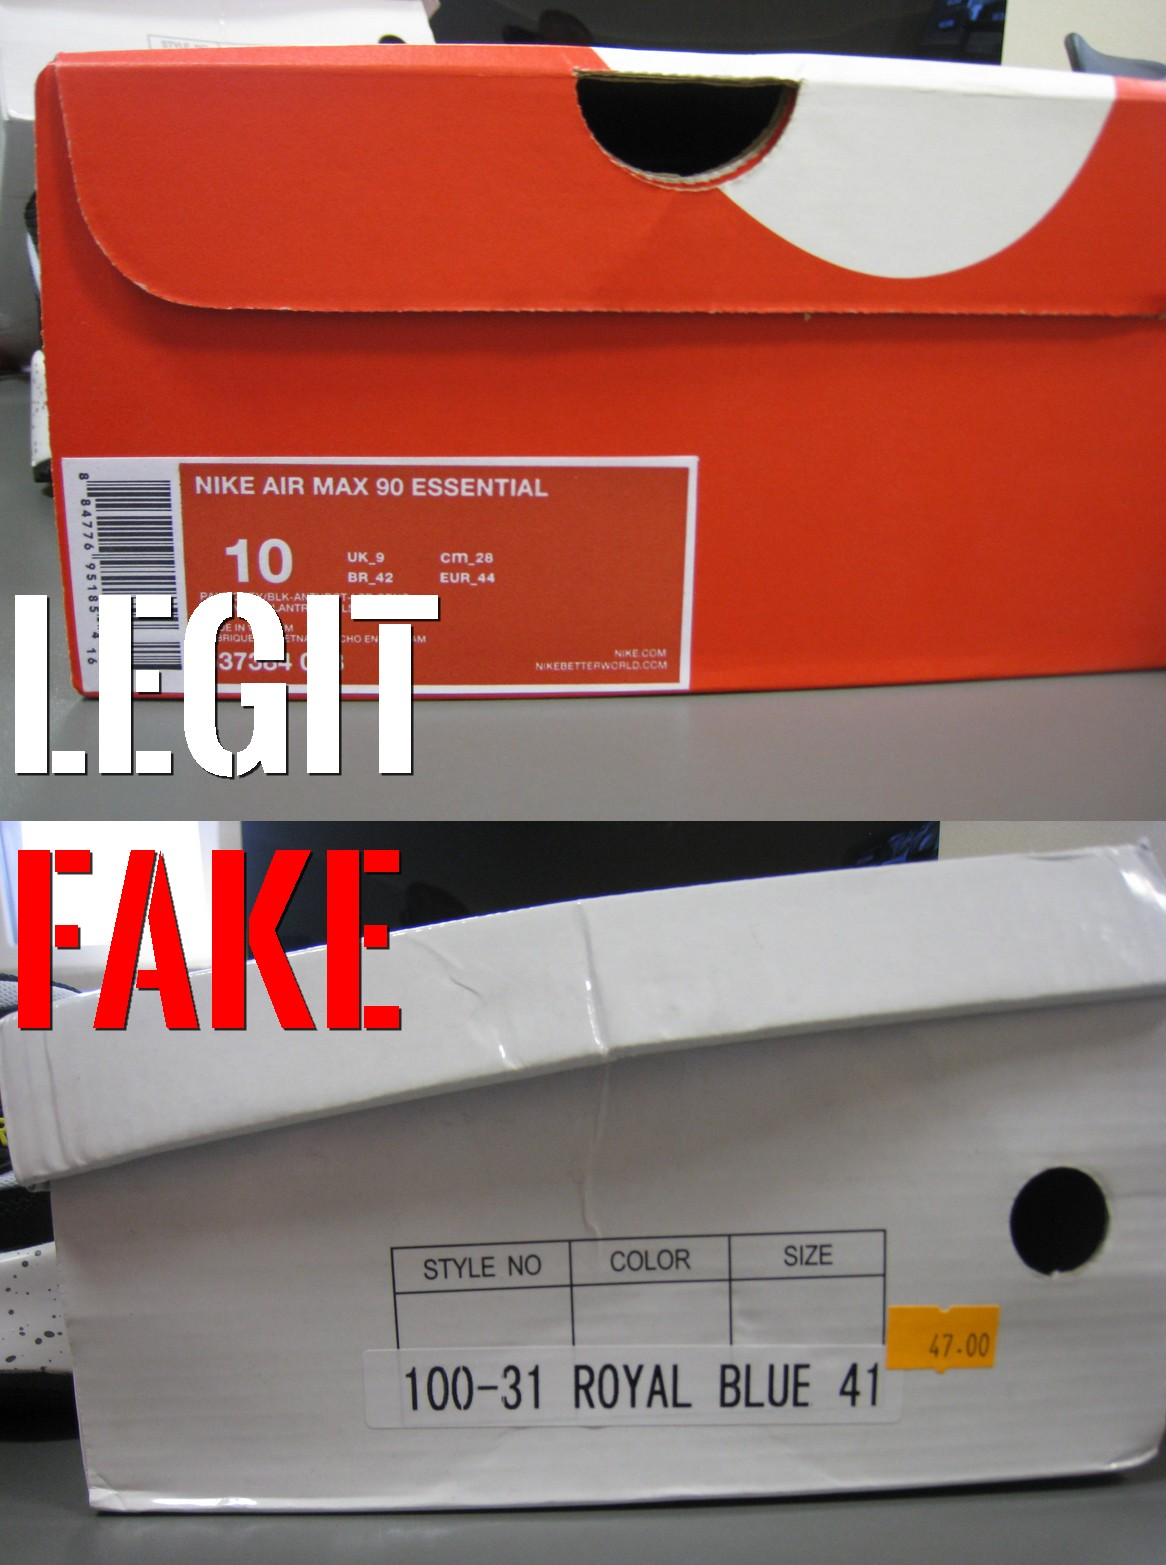 podróbka Nike Air Max 90 etykieta na pudełku